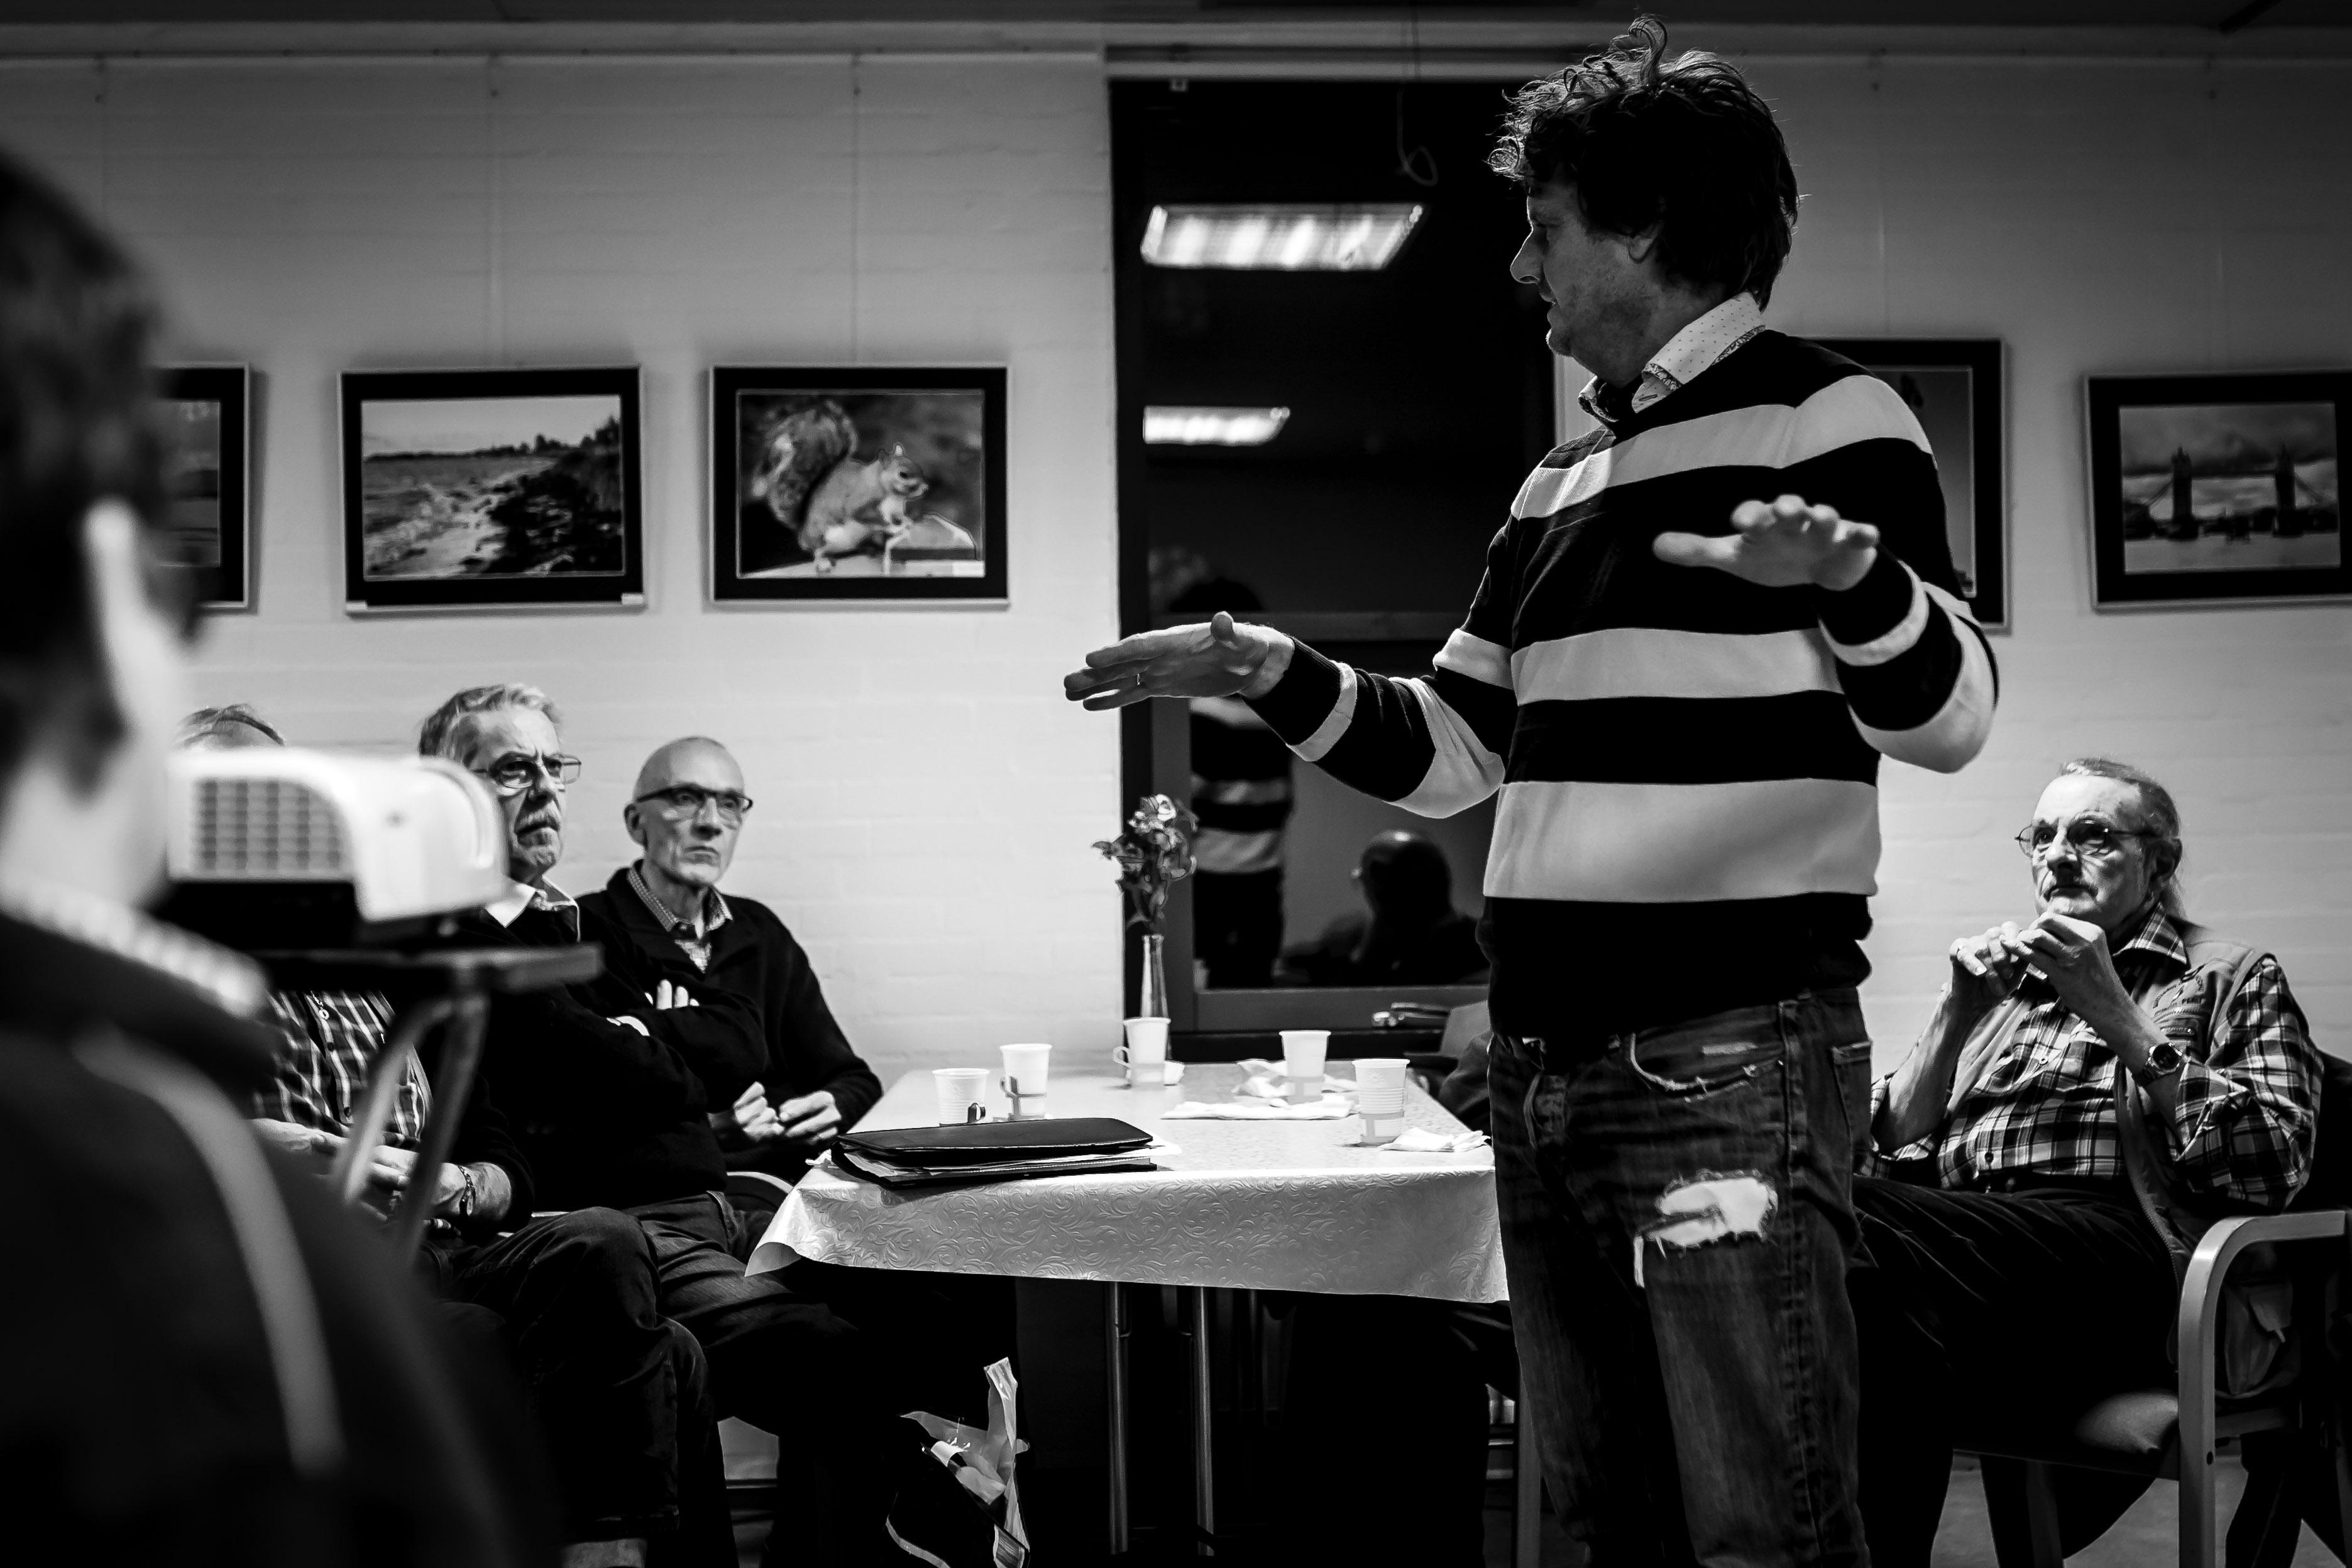 Fotoklub Kalundborg-møde (4 of 4)